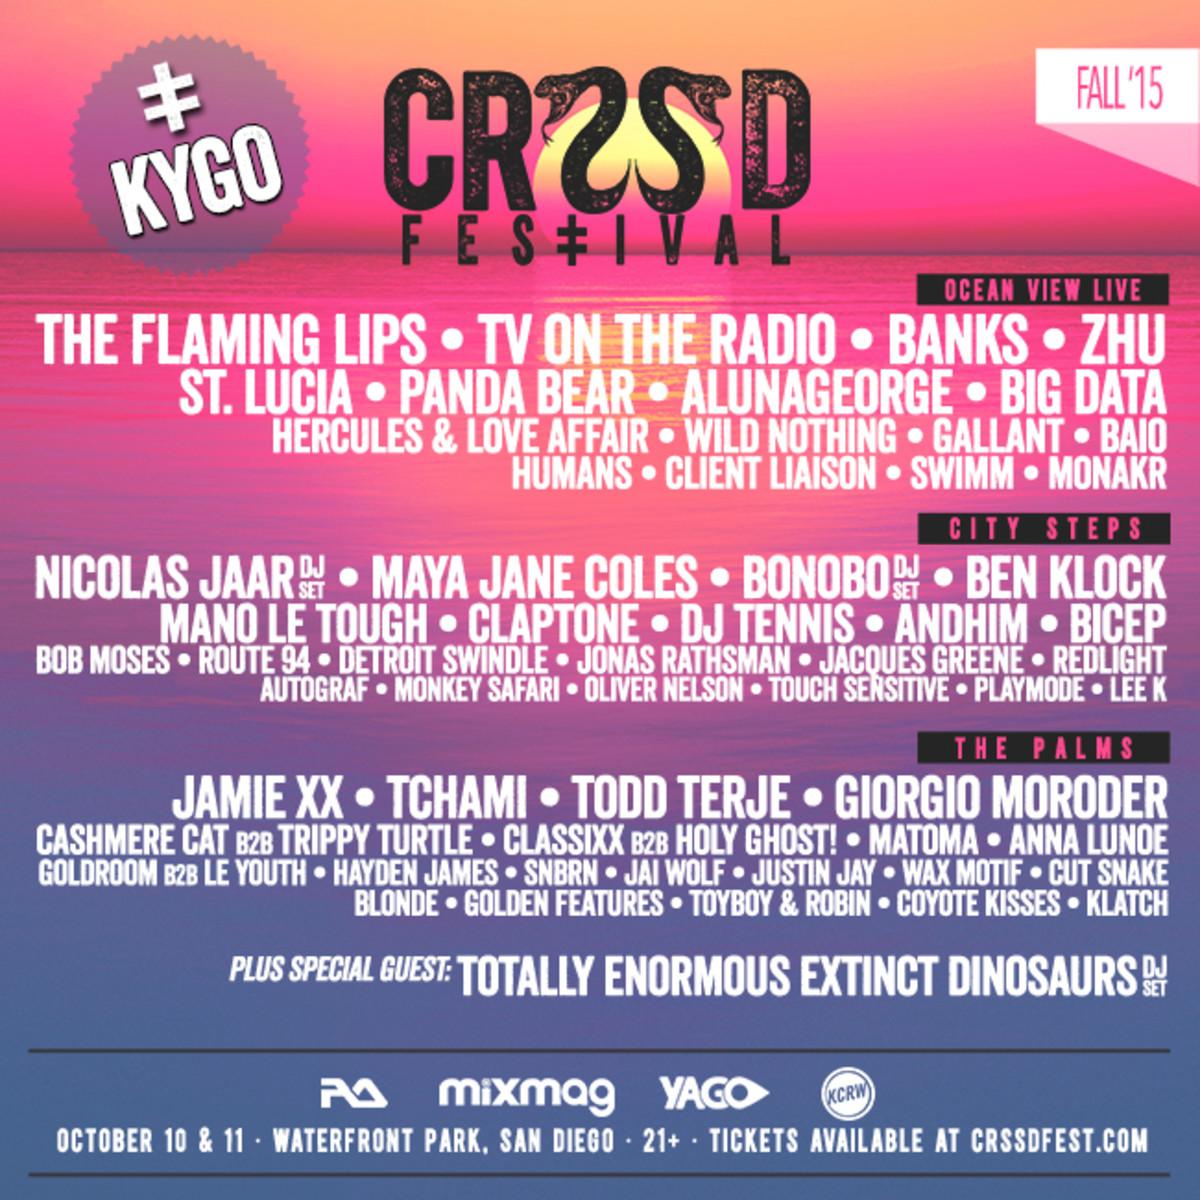 CRSSD fest full lineup